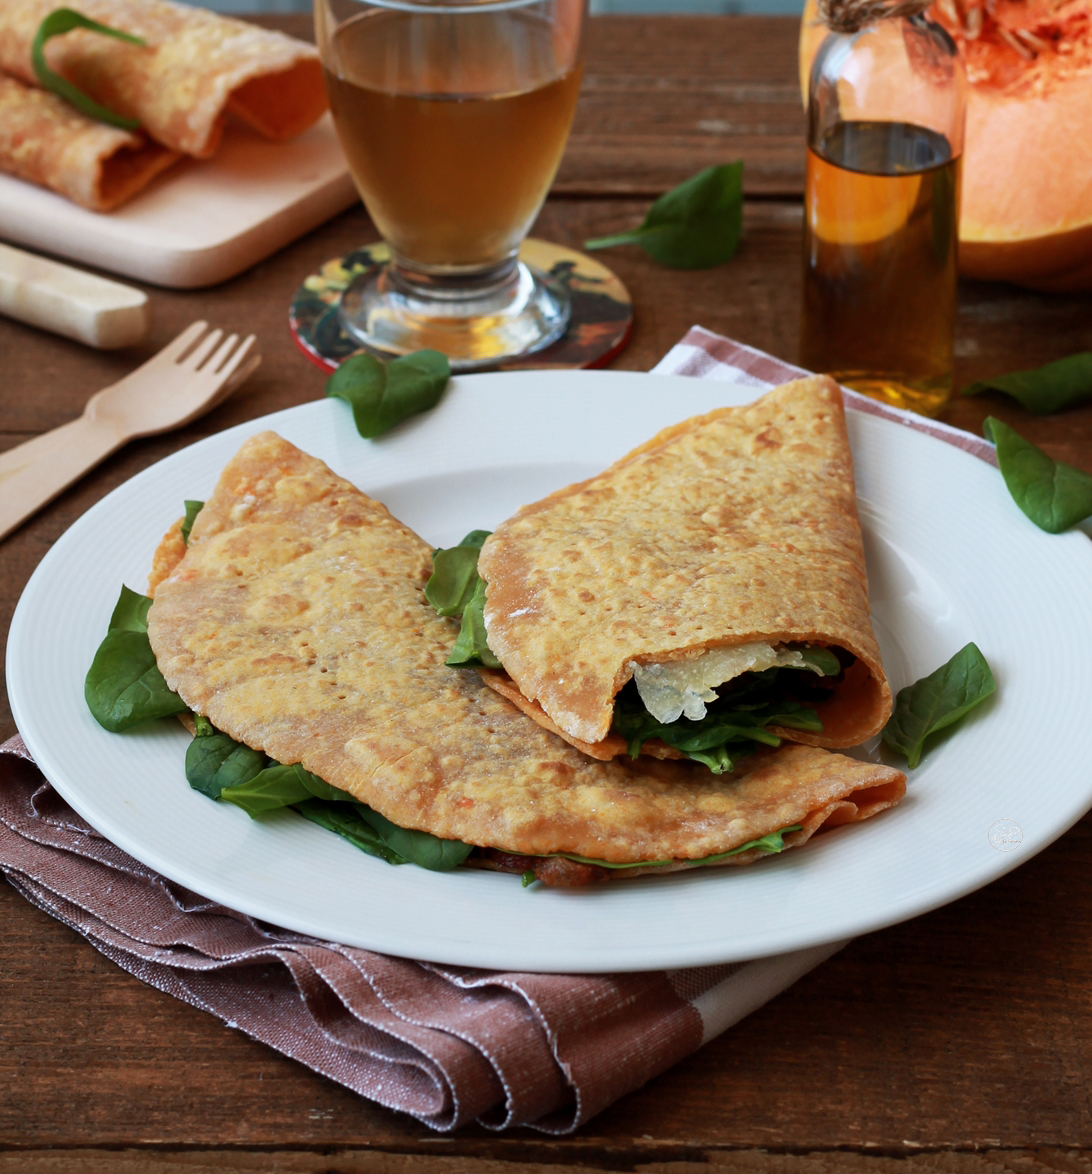 Piadina au potiron sans gluten - La Cassata Celiaca